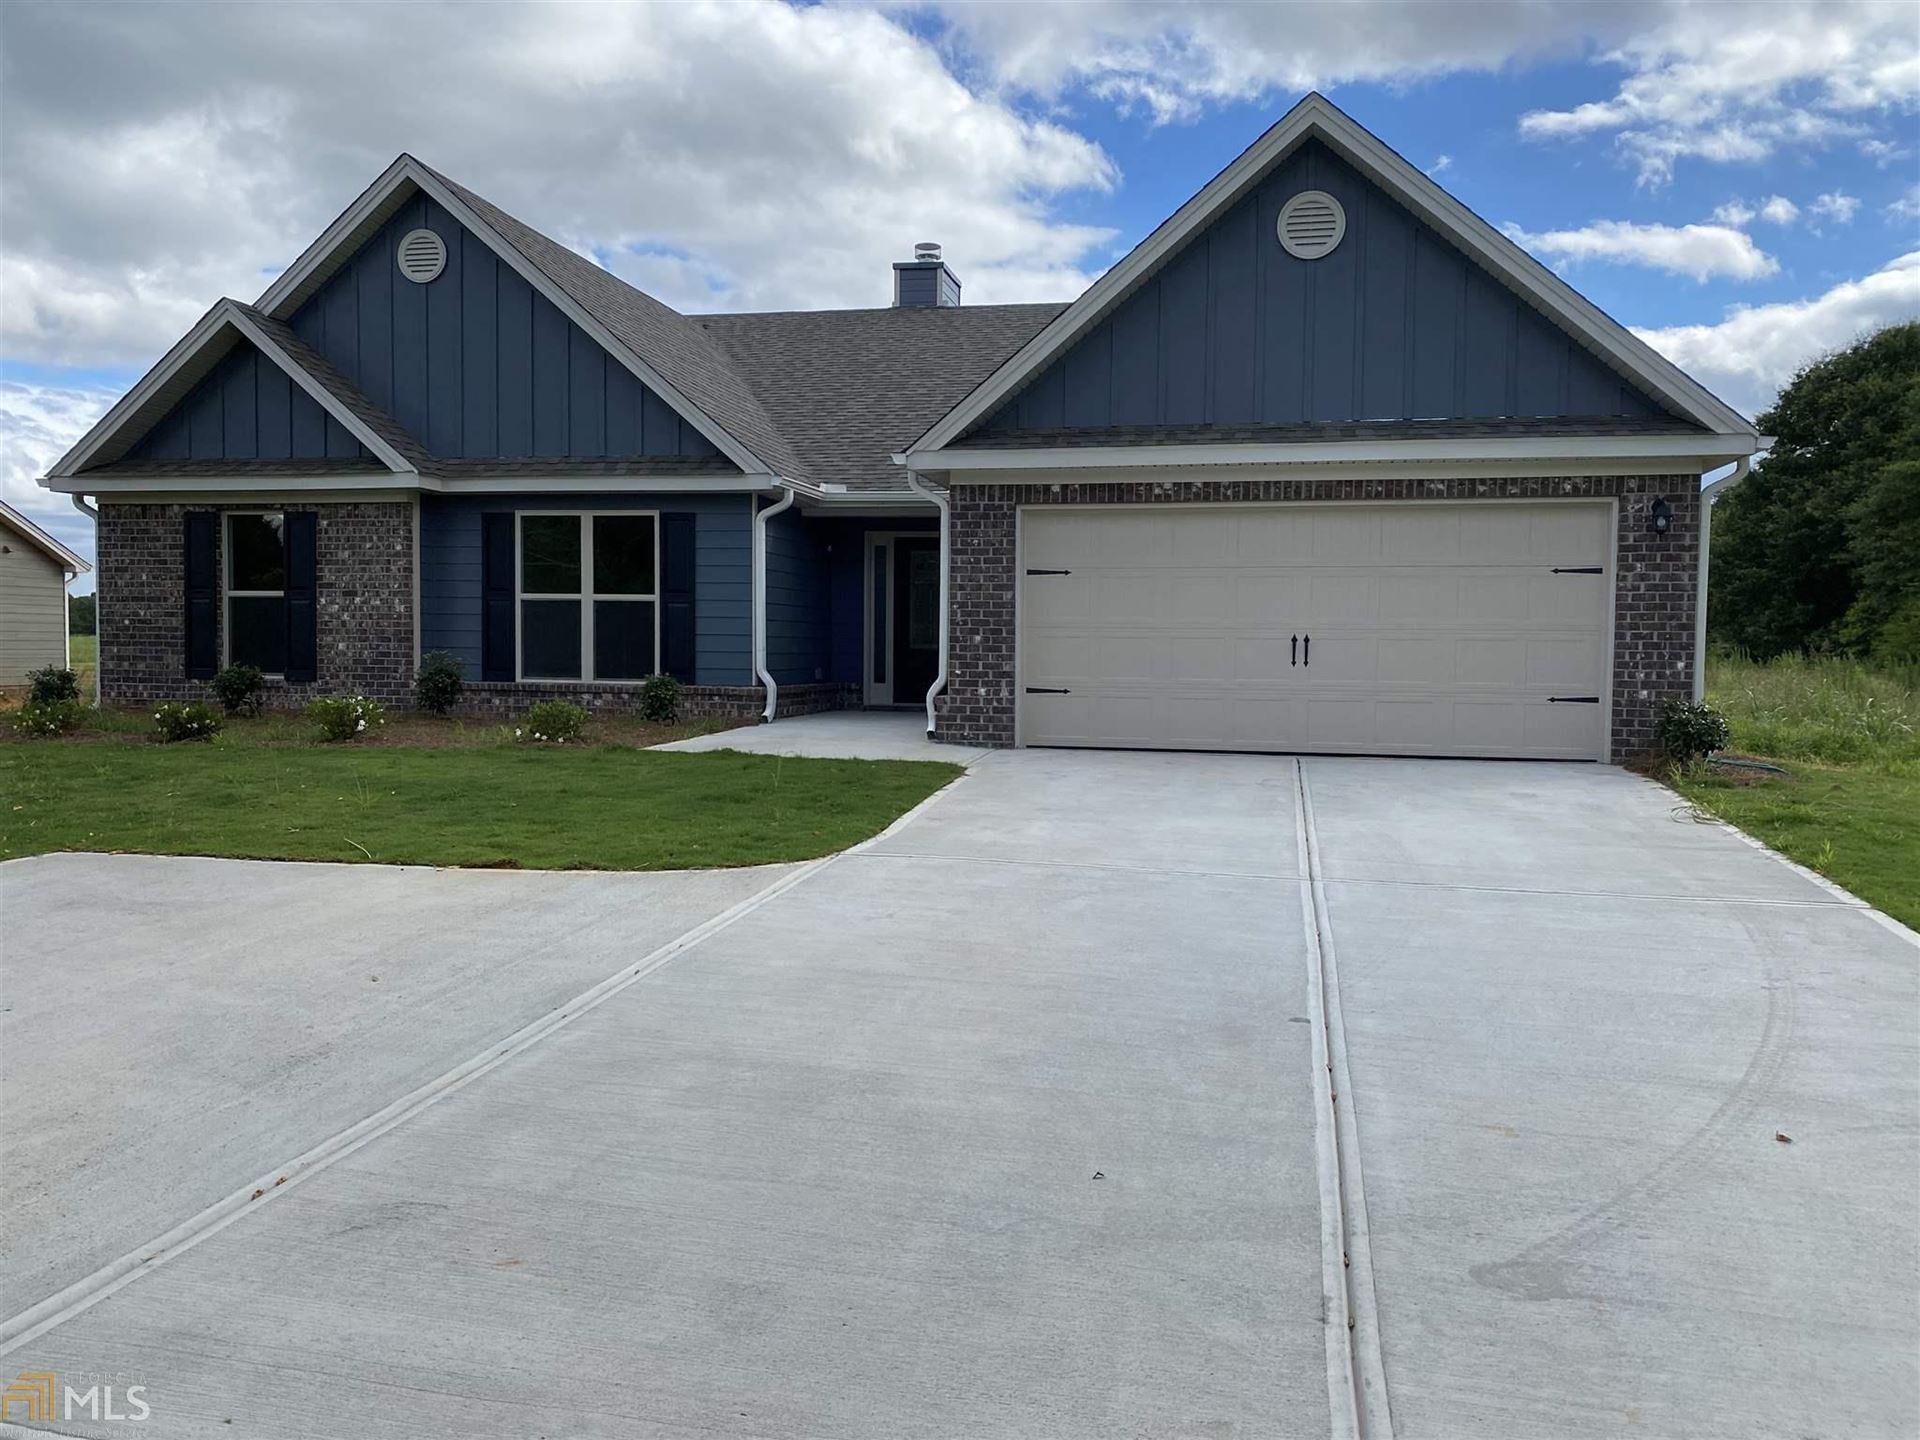 1353 Perkins Rd, Winder, GA 30680 - #: 8805483